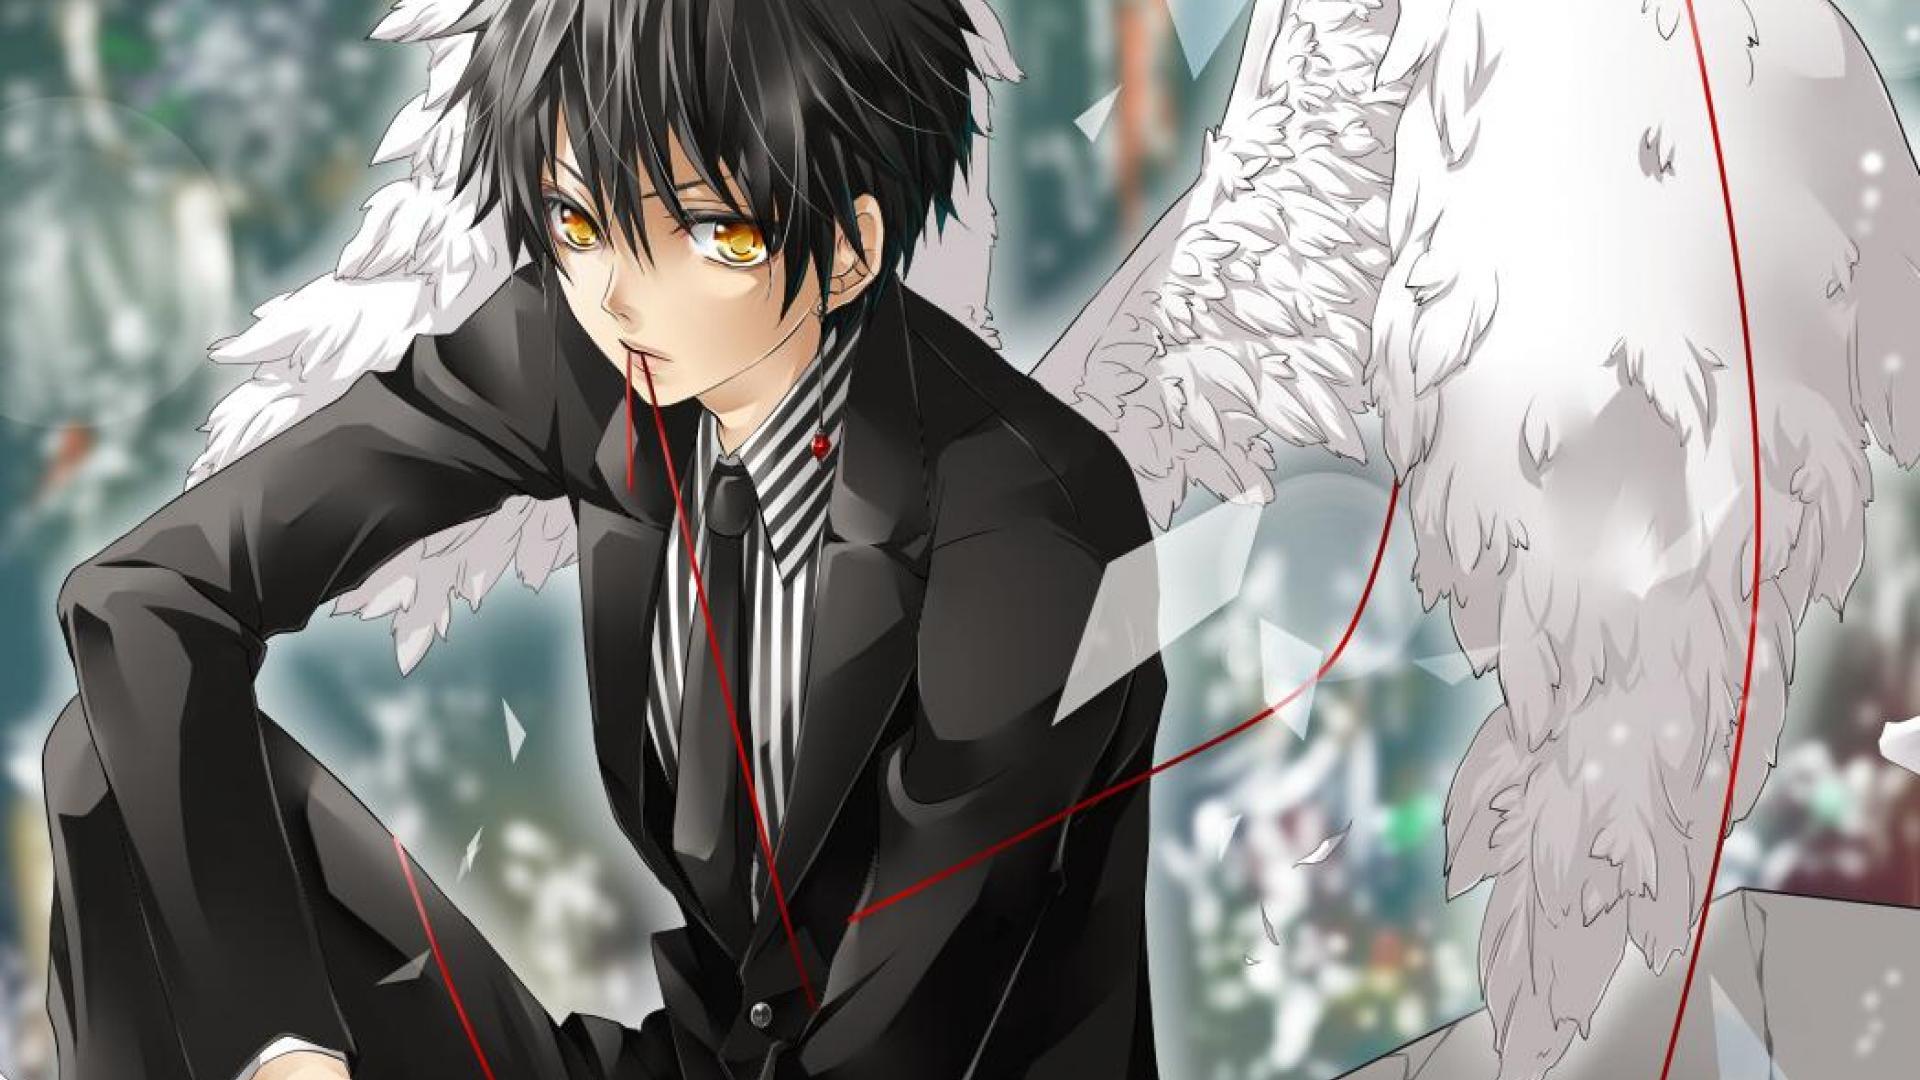 anime guy wallpaper Cute